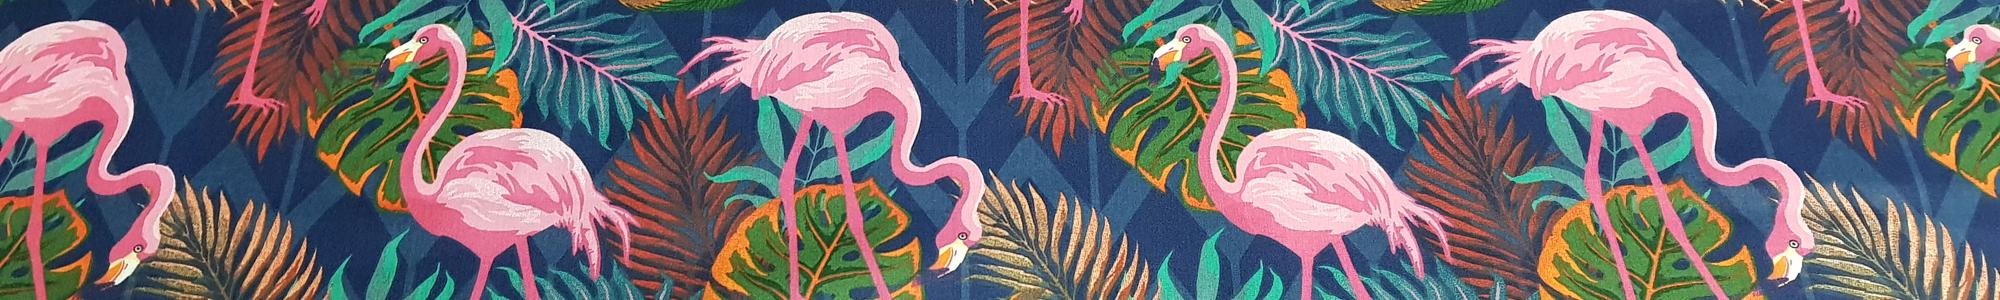 Banner 300 - Flamingo